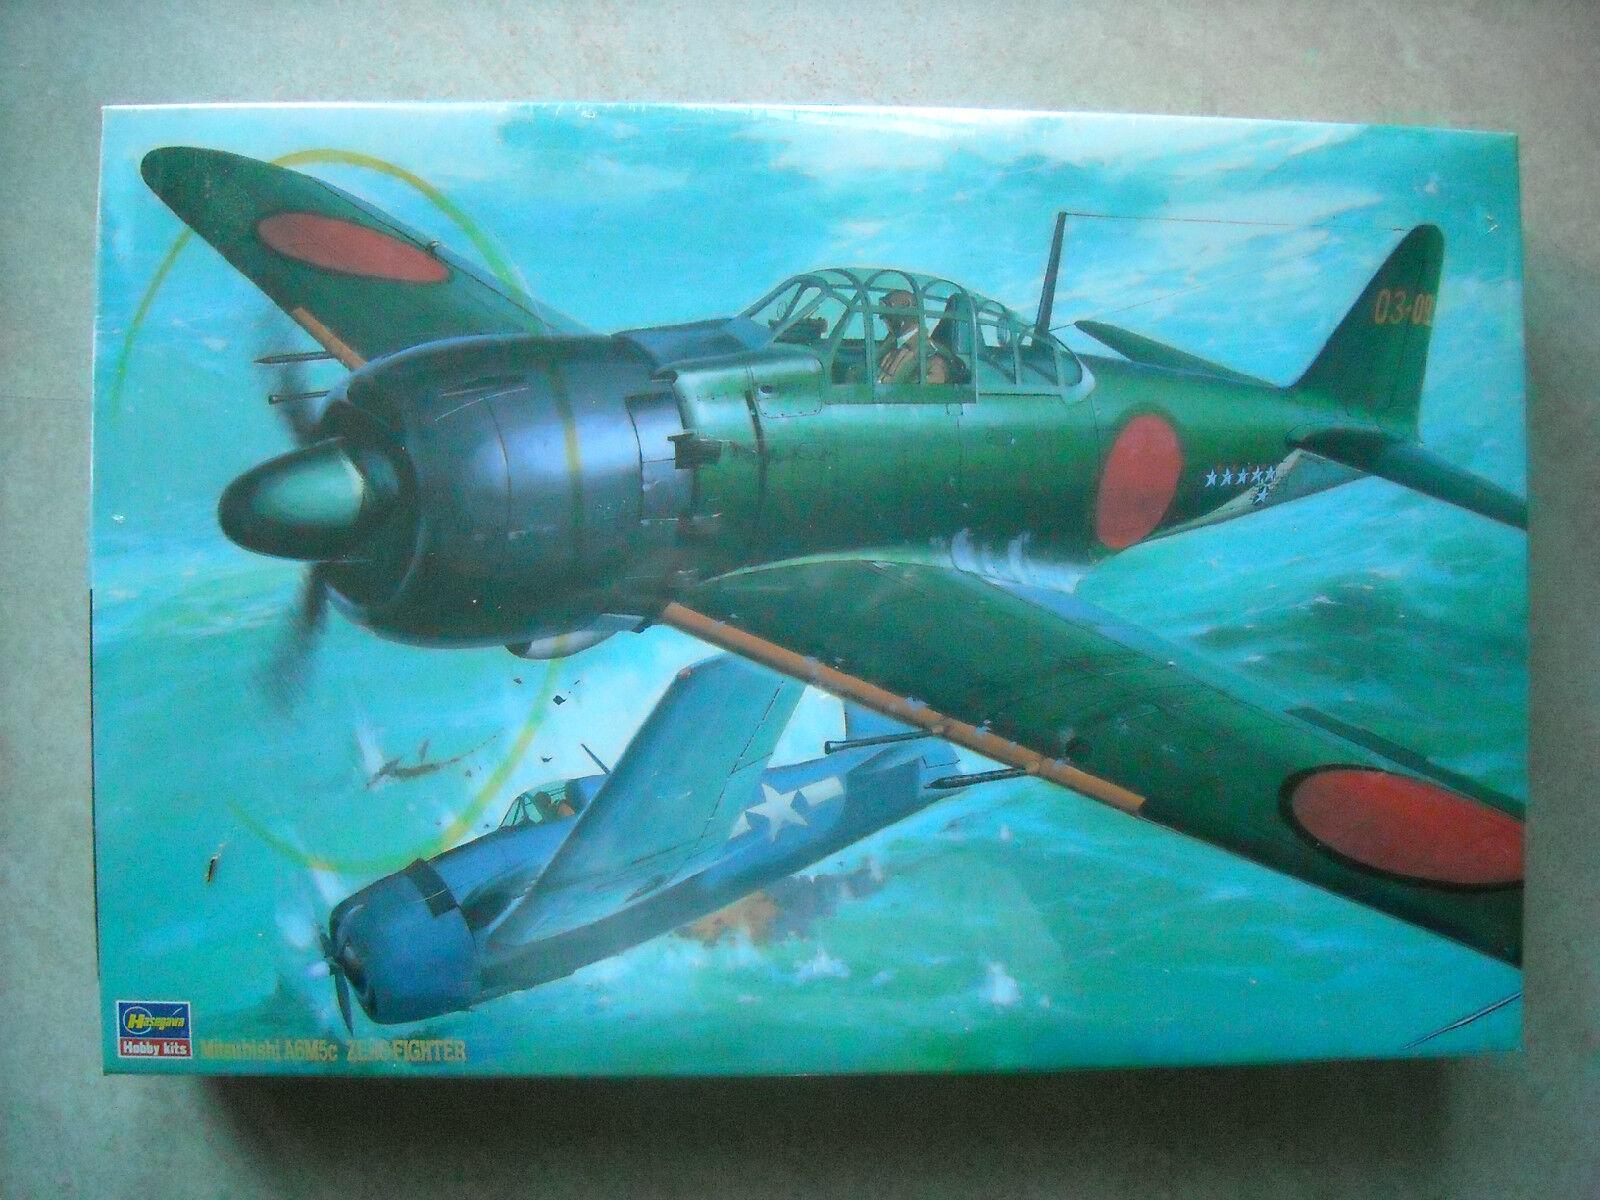 HasegawA-1 32- ITSUBISHI A6M5c ZERO FIGHTER